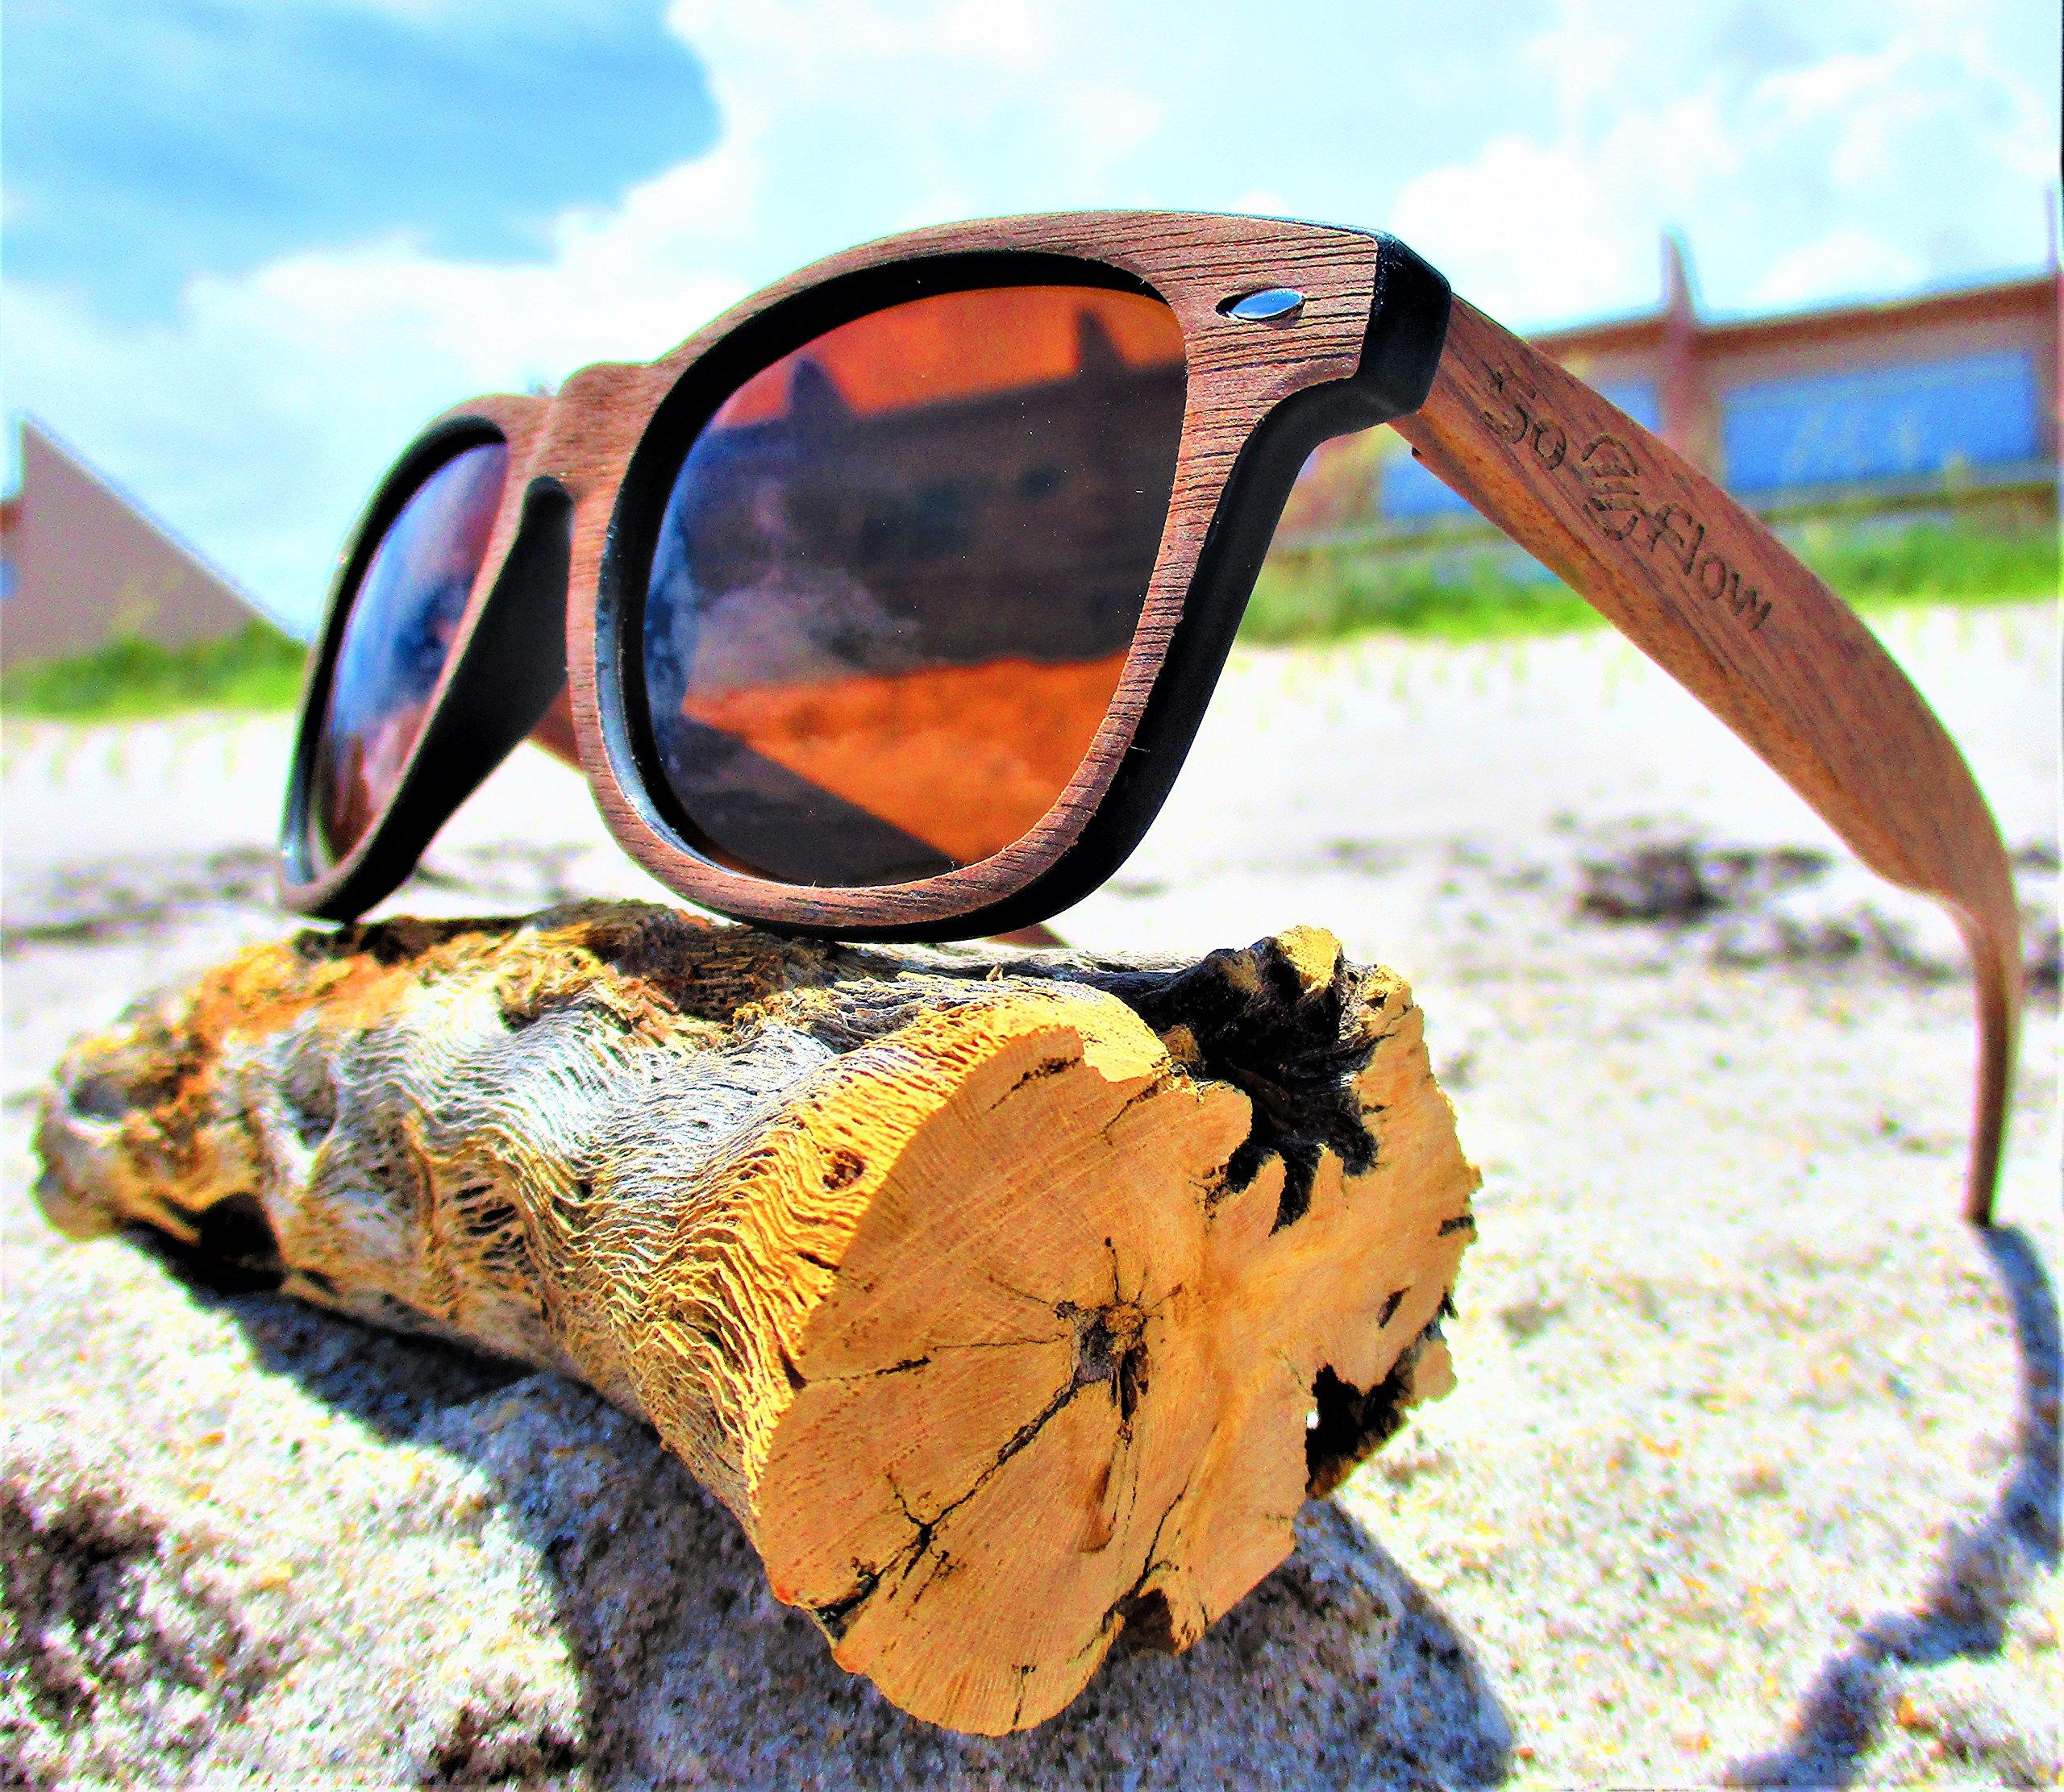 Polarized Brown Walnut Wood Sunglasses - Wooden - Wayfarer - Men - Women - UV400 by SoFlow Sunglasses (Image #4)